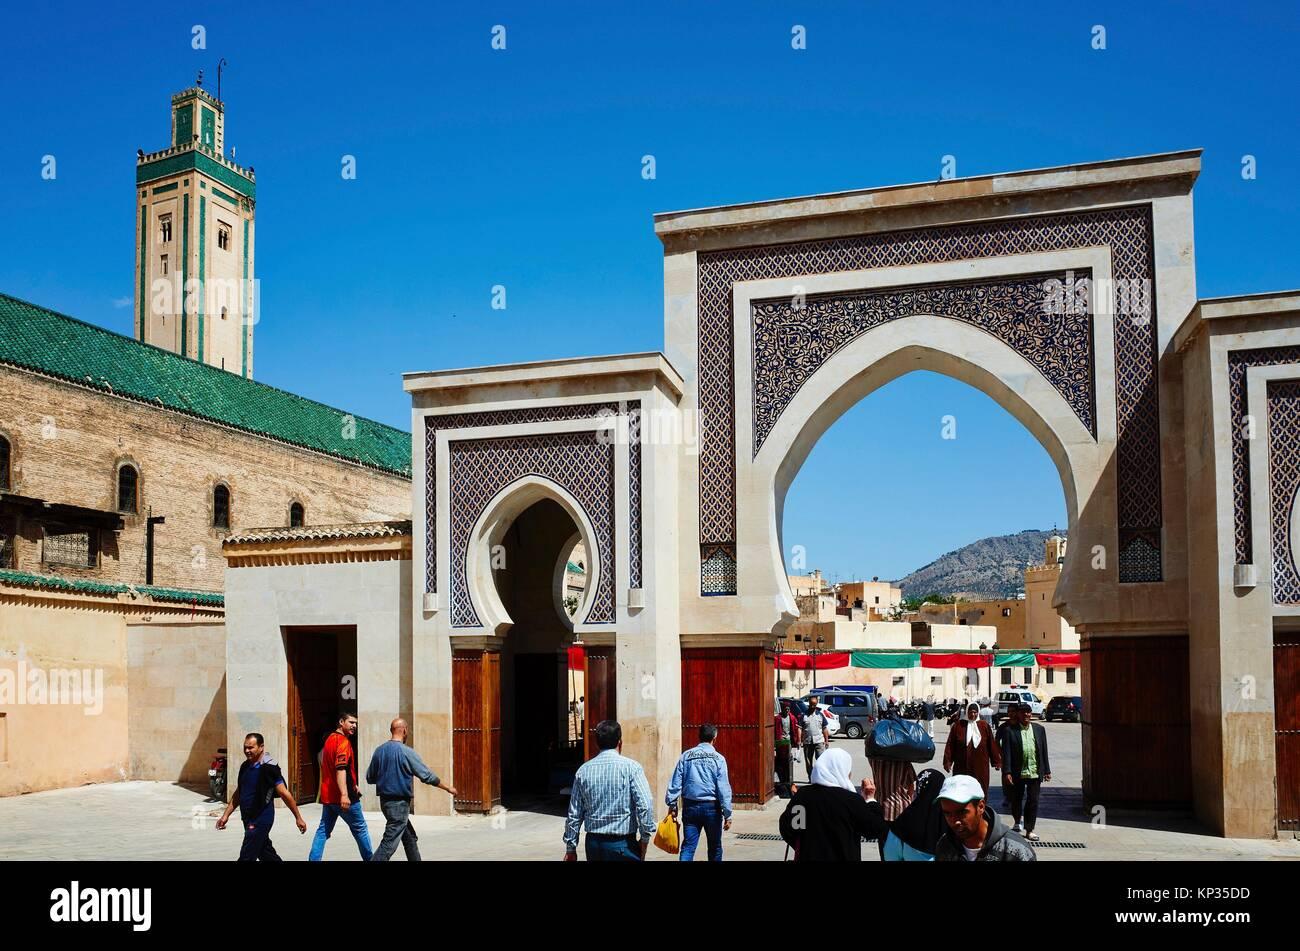 Bab Rcif gate to the medina of Fez, Morocco - Stock Image